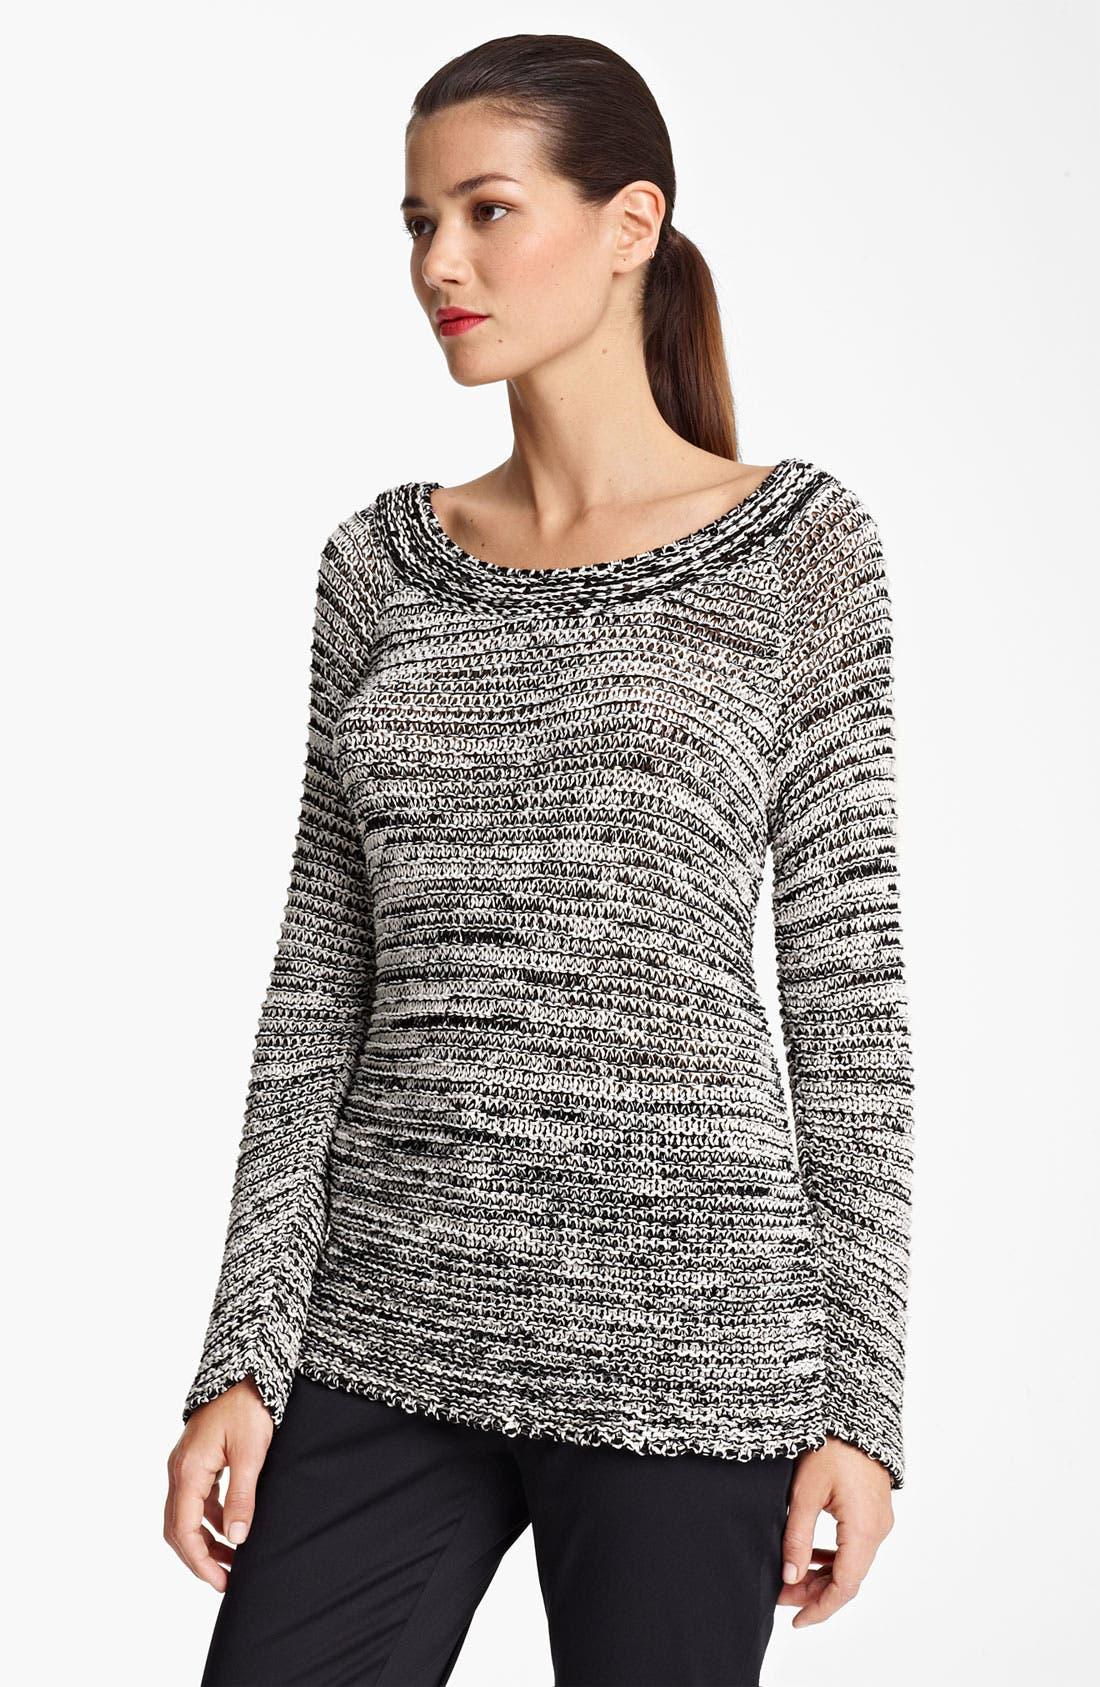 Alternate Image 1 Selected - Piazza Sempione Sequin Neckline Crochet Knit Sweater